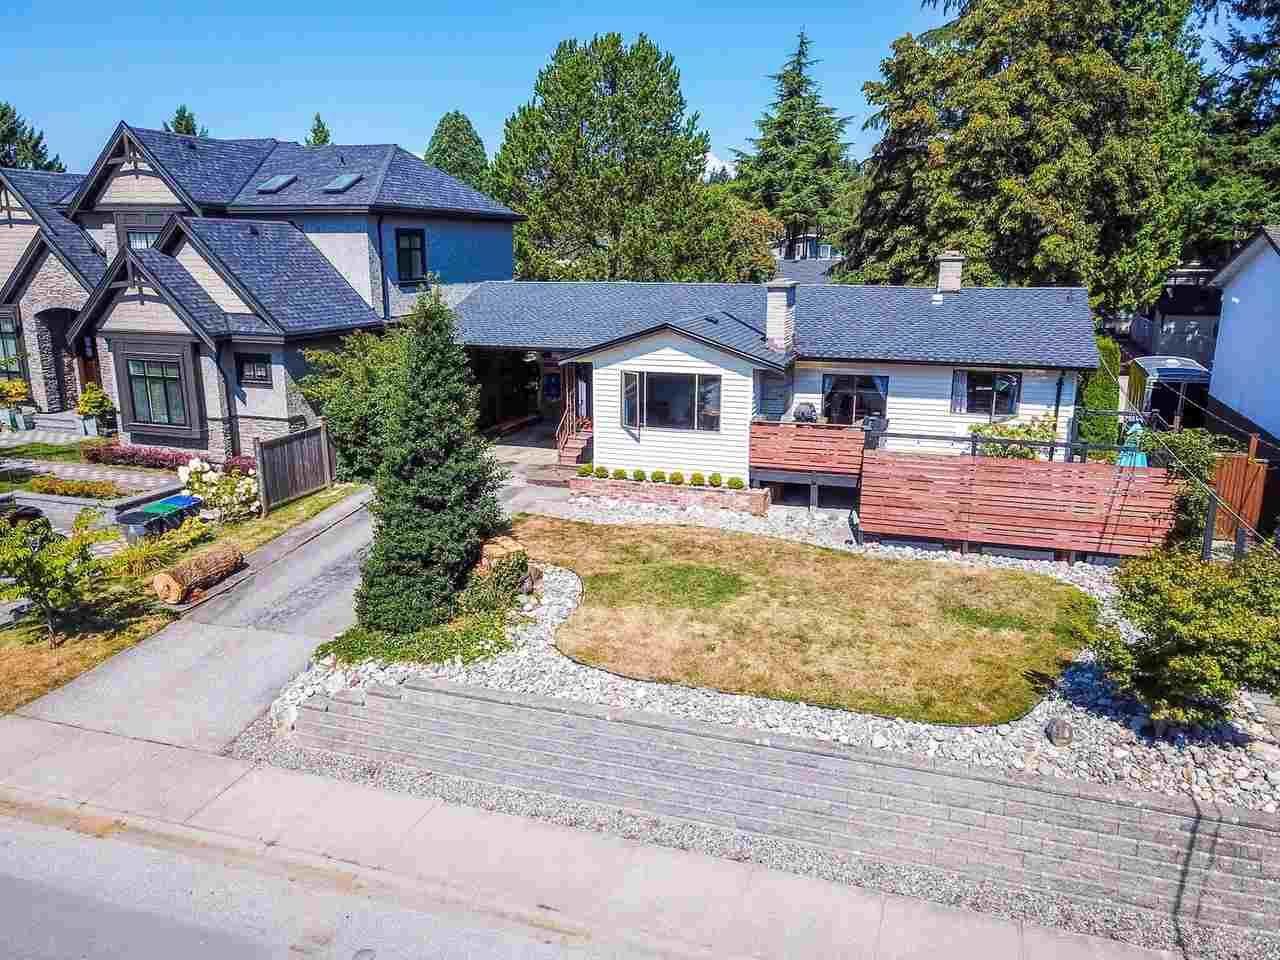 Main Photo: 14485 17 Avenue in Surrey: Sunnyside Park Surrey House for sale (South Surrey White Rock)  : MLS®# R2492269